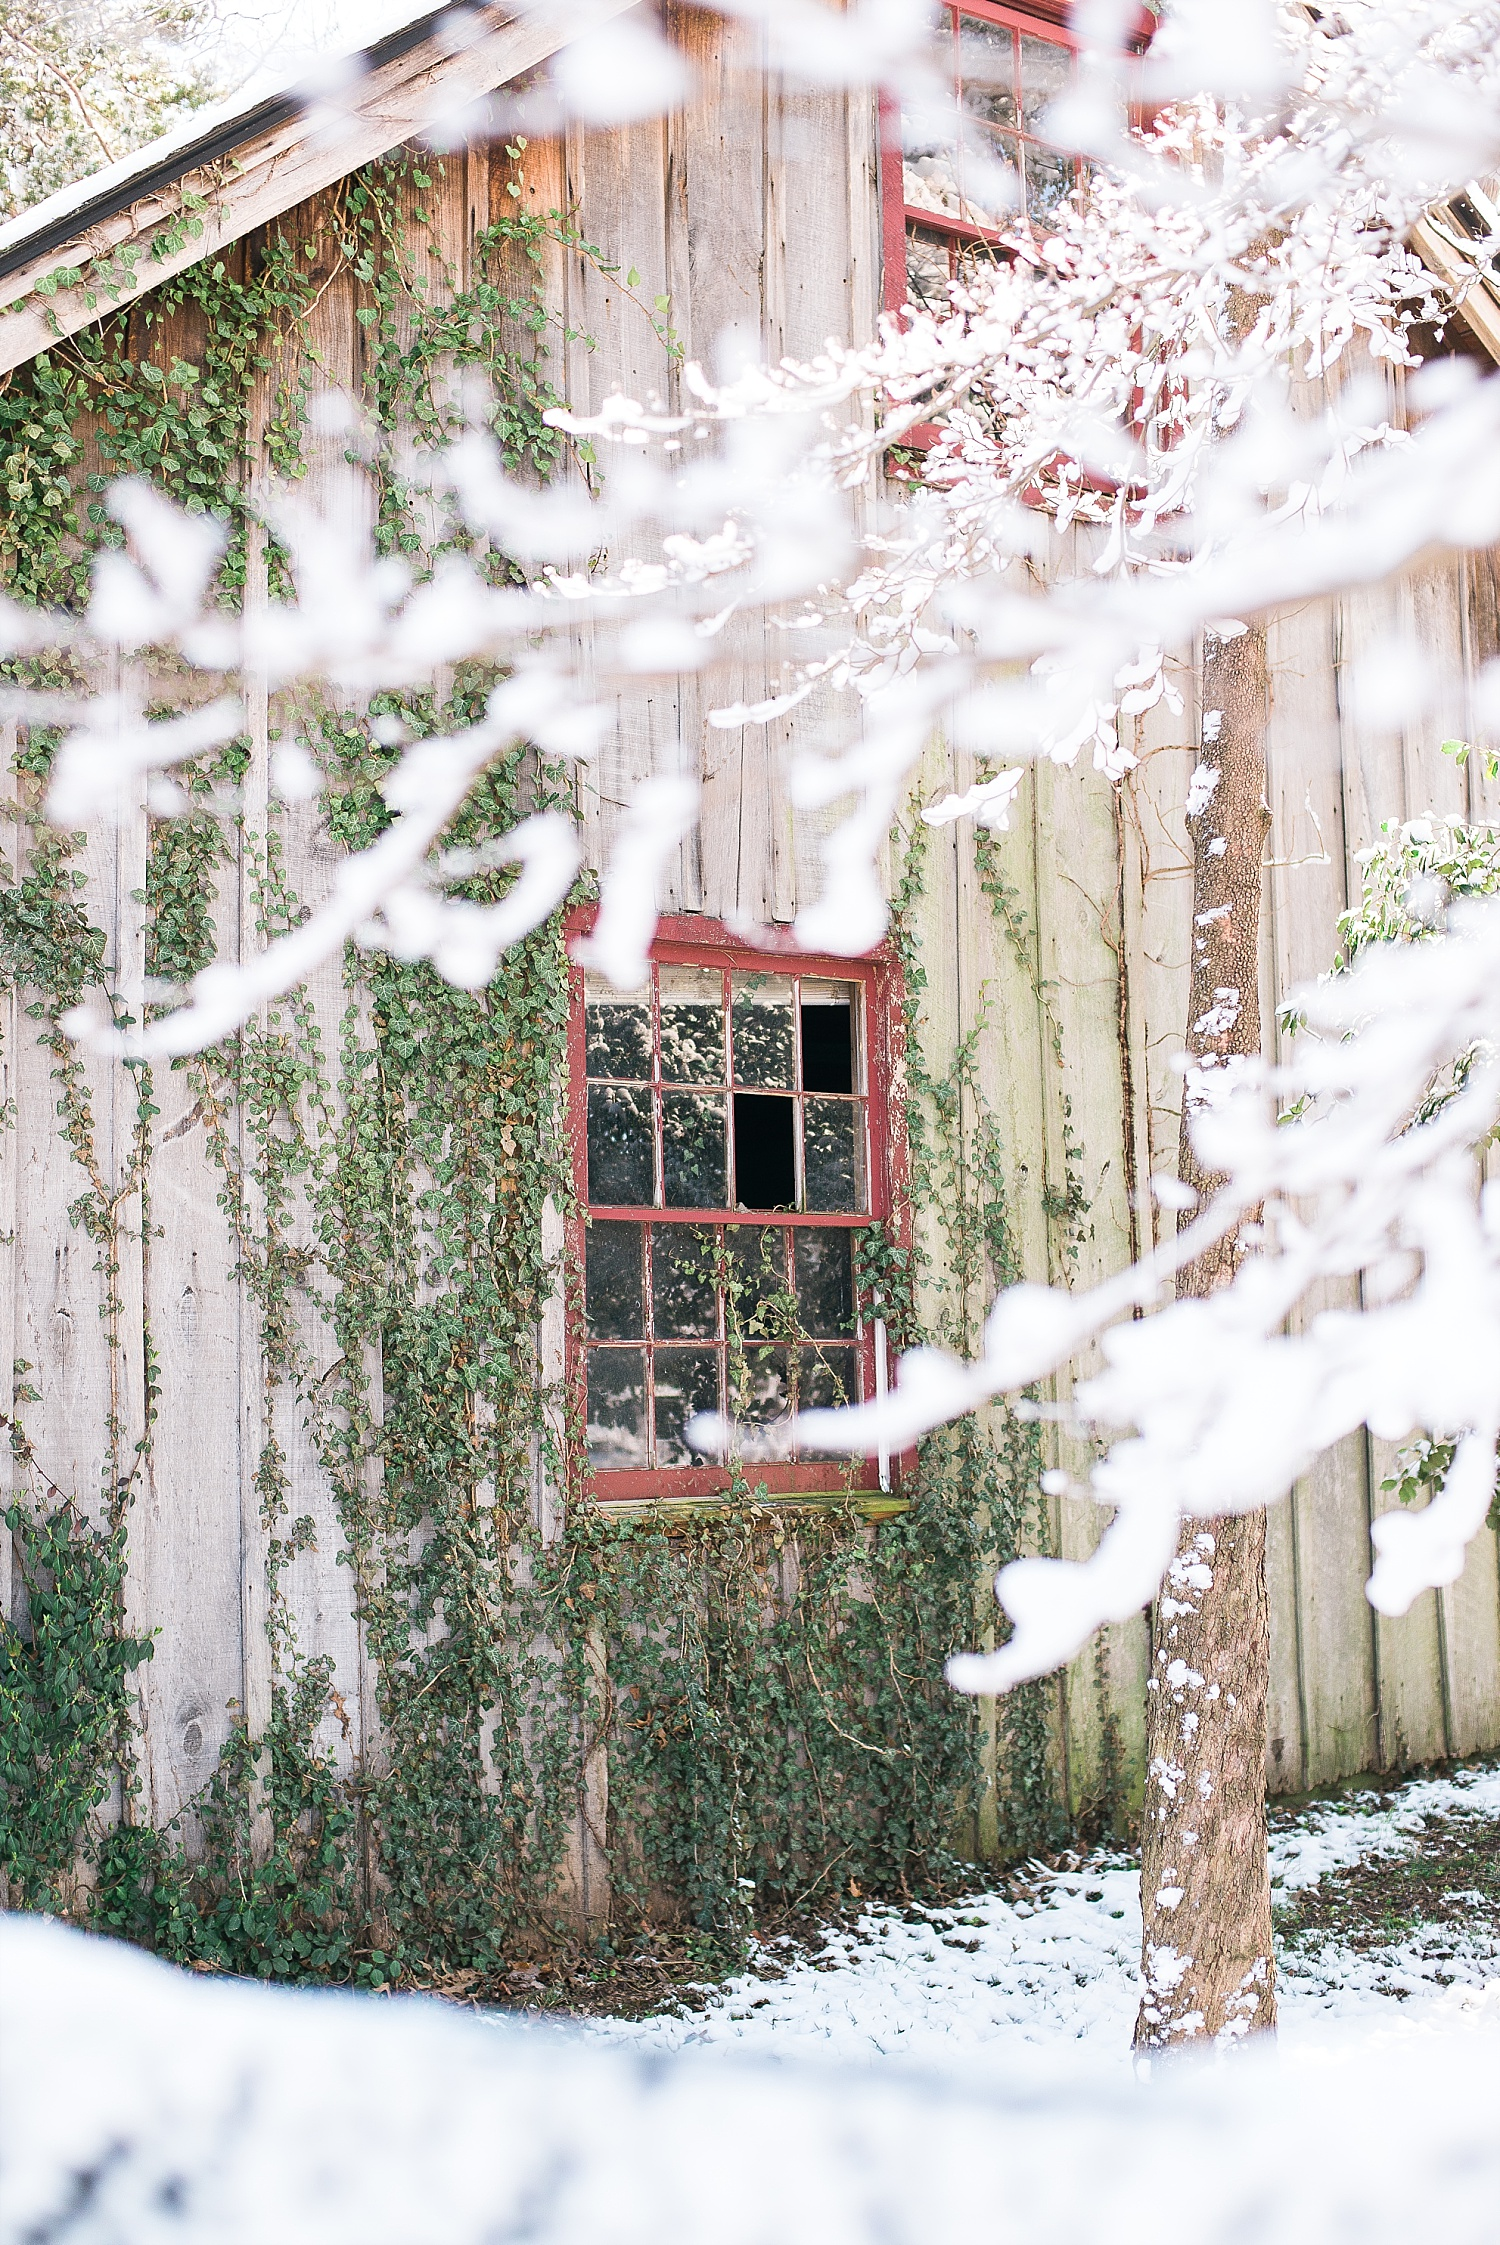 kentucky-in-the-winter